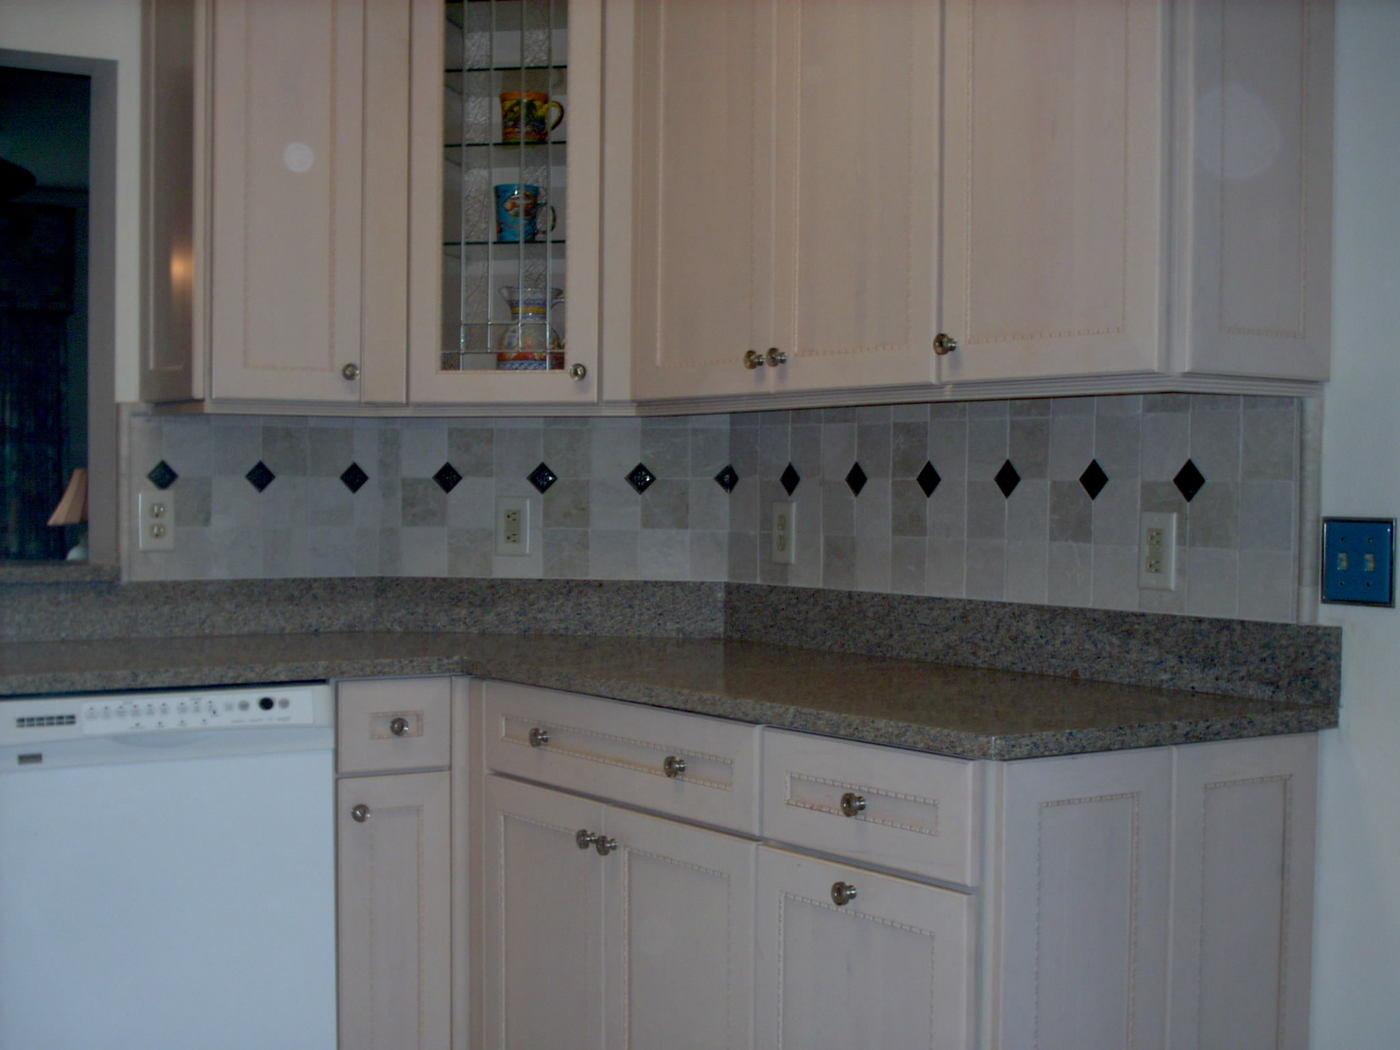 Downs kitchen backsplash by francis fernandez at for Certified kitchen and bath designer salary